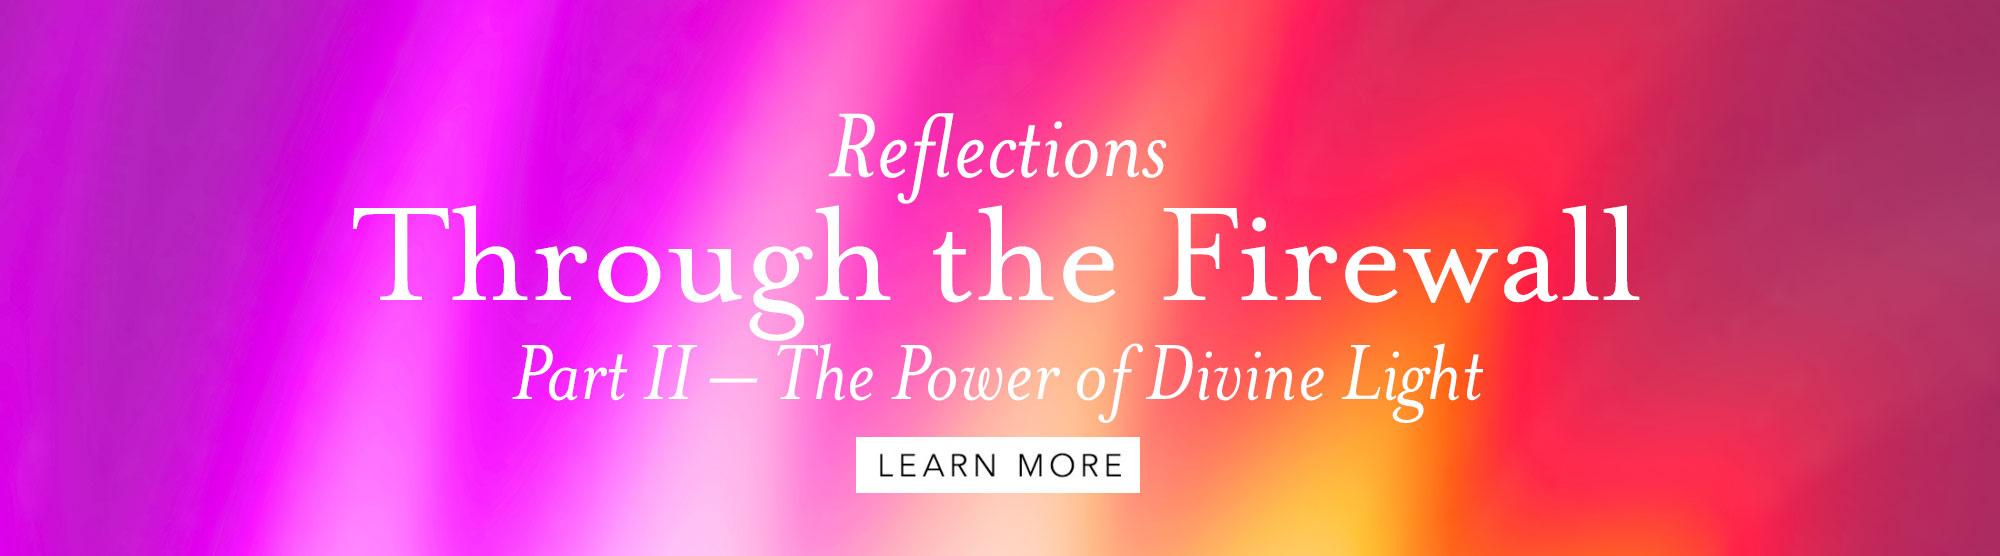 Through the Firewall Part II: The Power of Divine Light